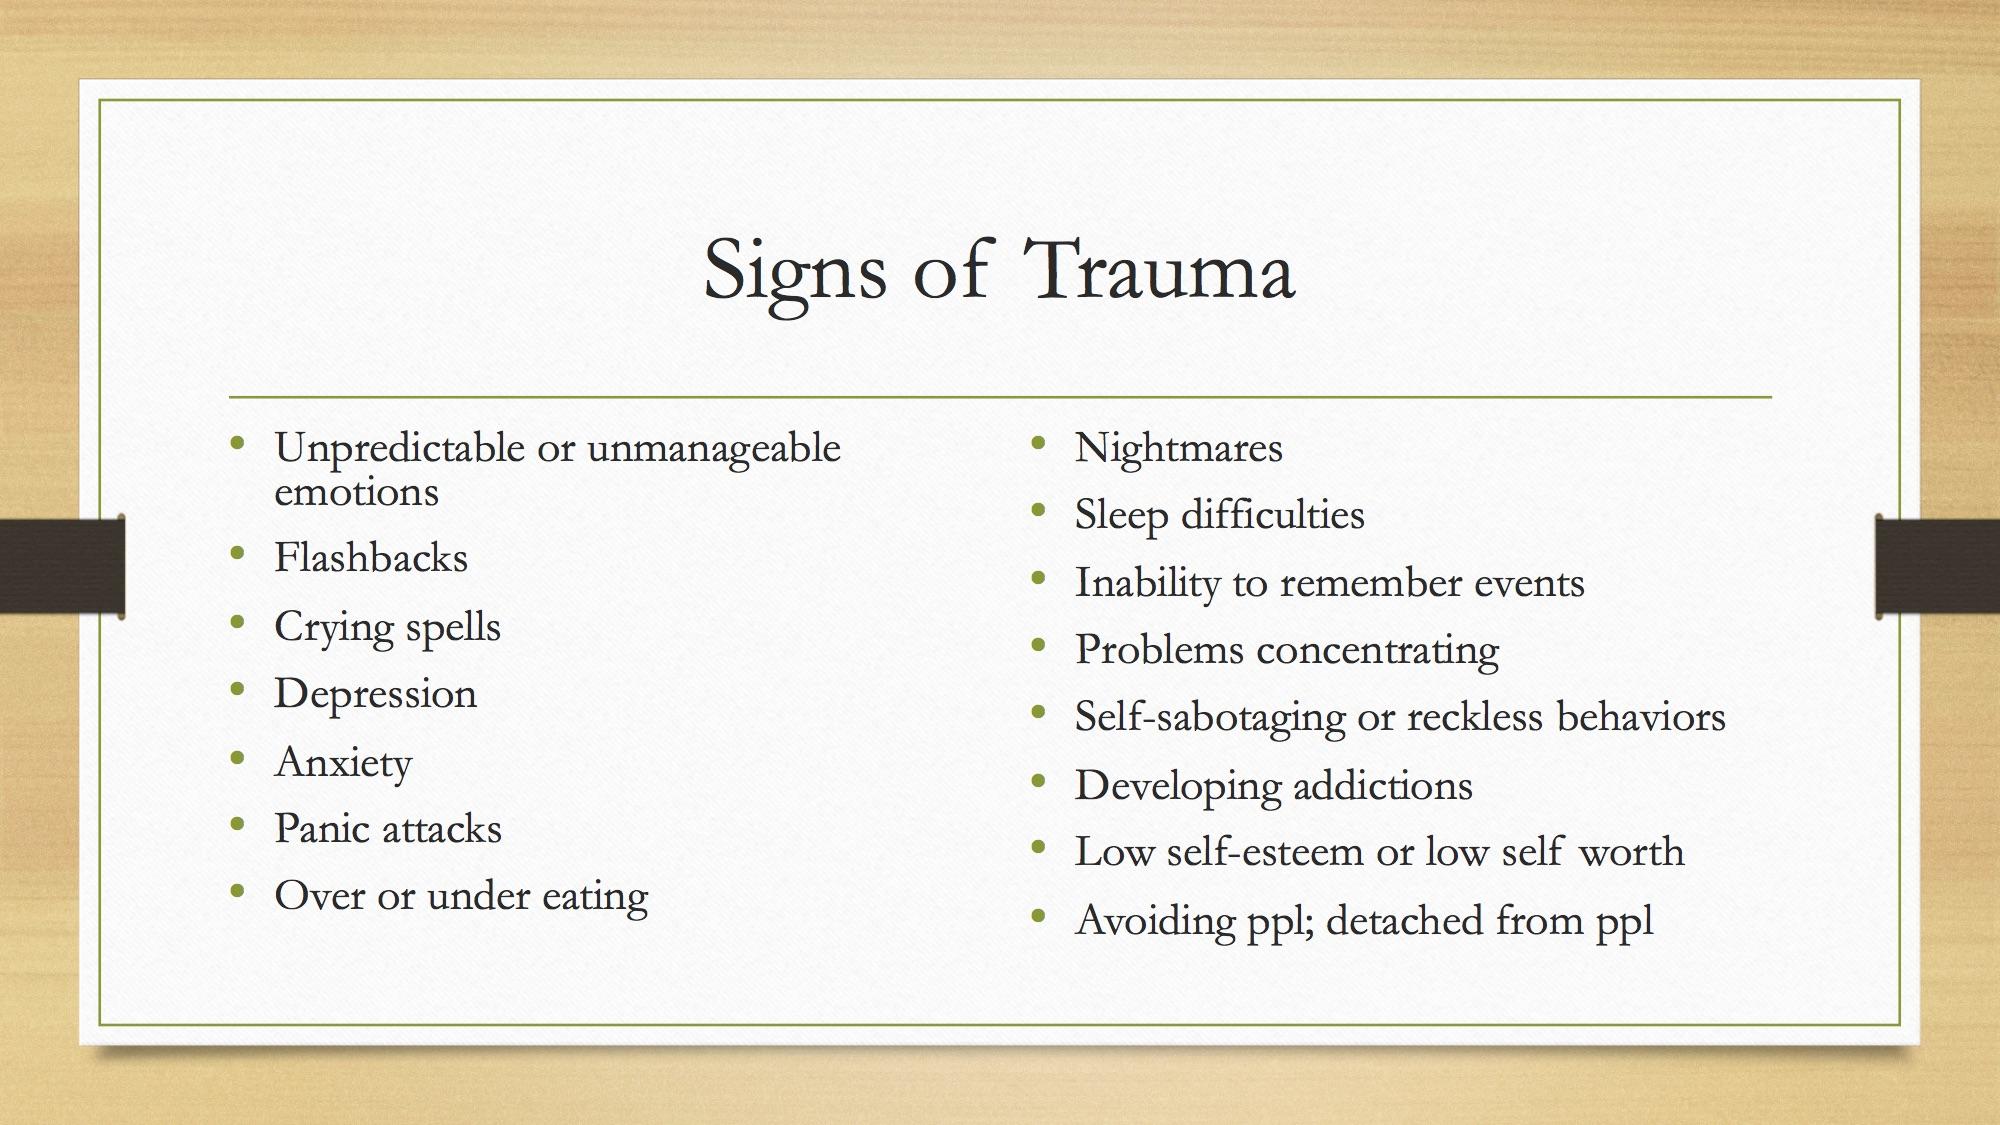 Signs of Trauma